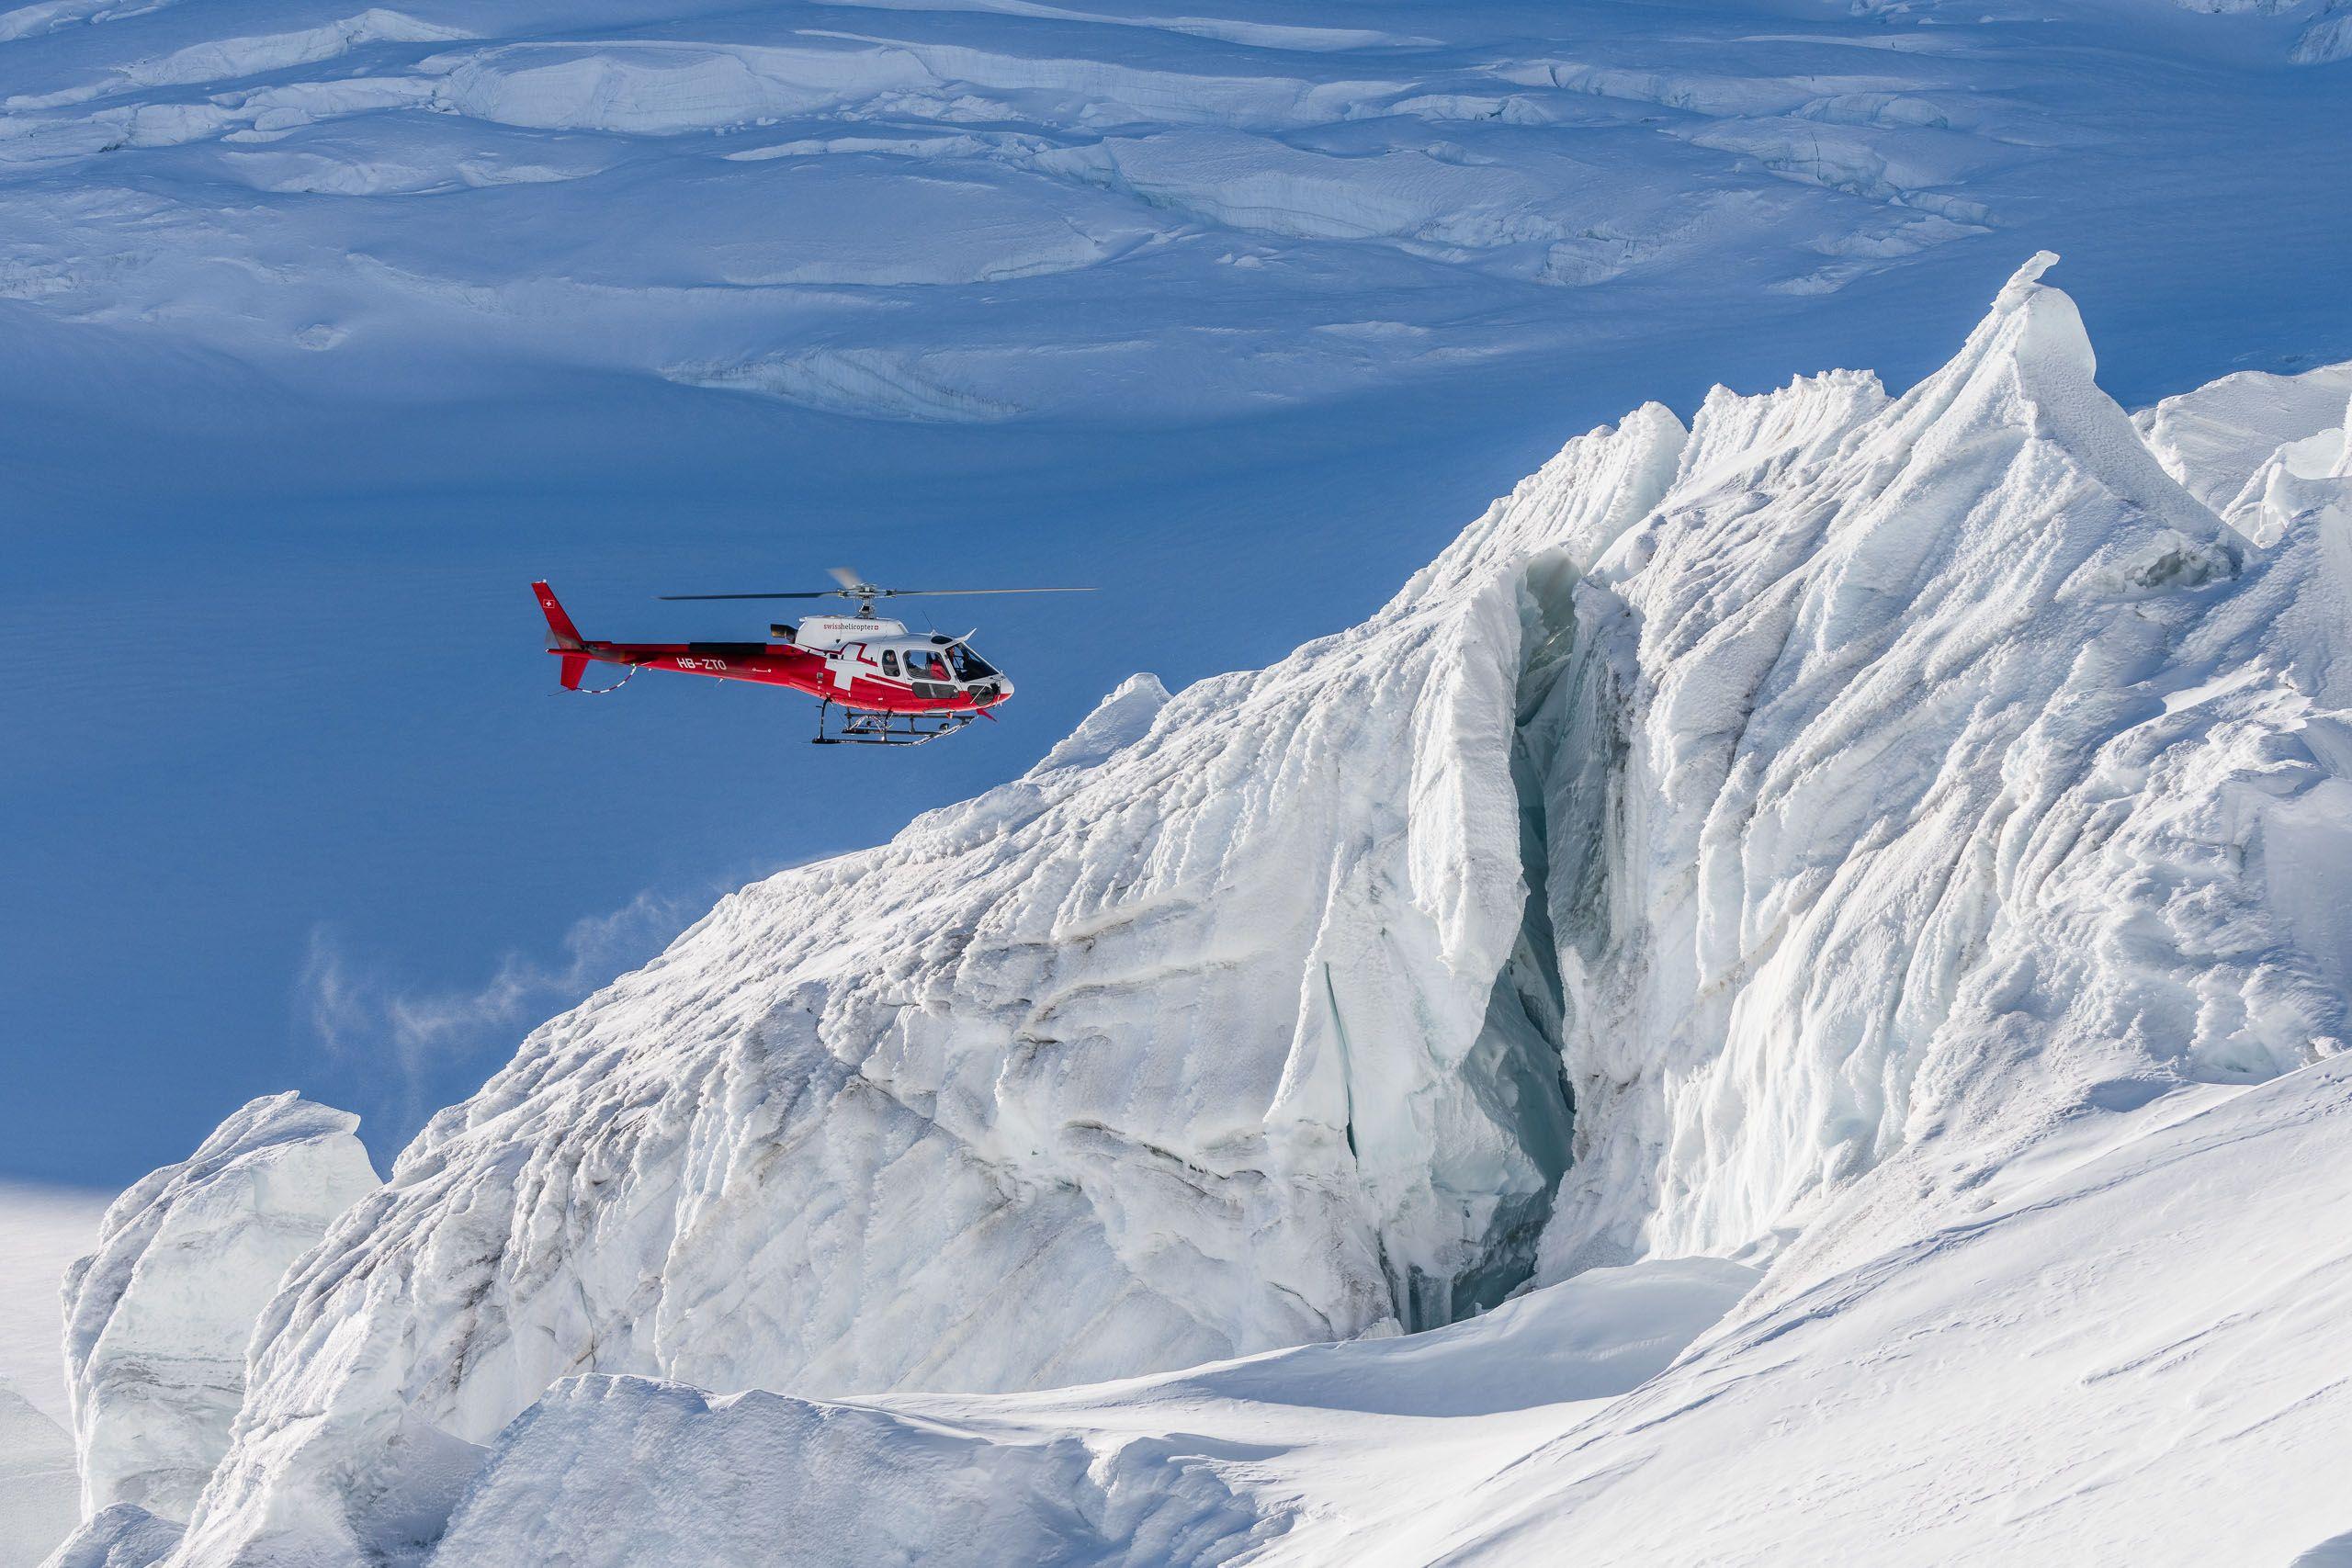 A85_0687-compressor_helikopterflug_gletscher